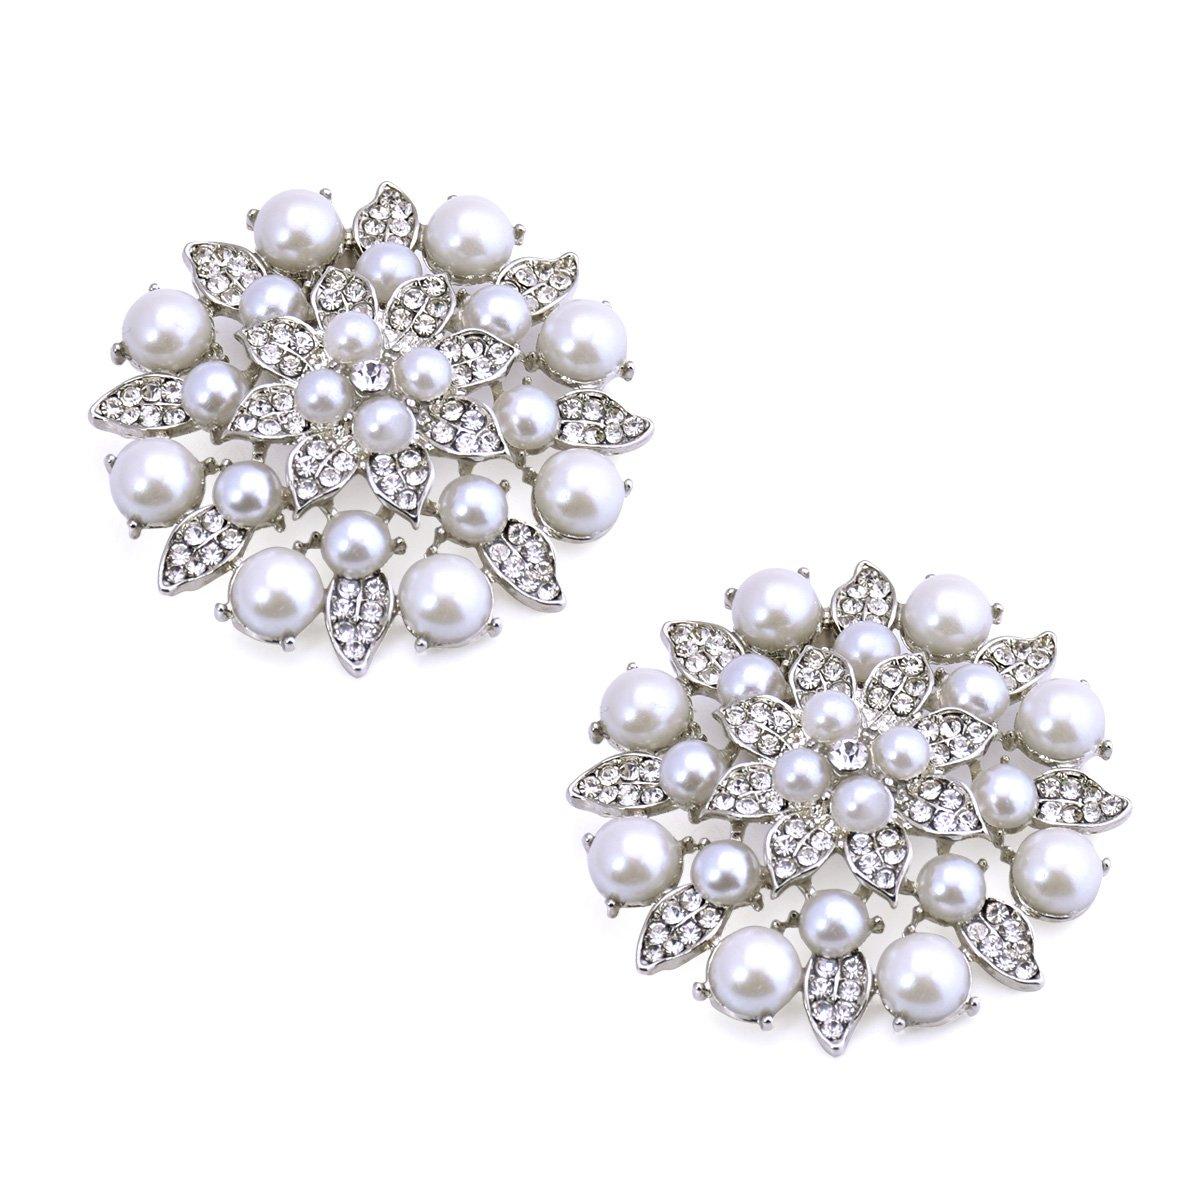 ElegantPark BK Fashion Rhinestones Pearls Women Wedding Accessories Dress Hat Shoes Clips 2 Pcs Silver